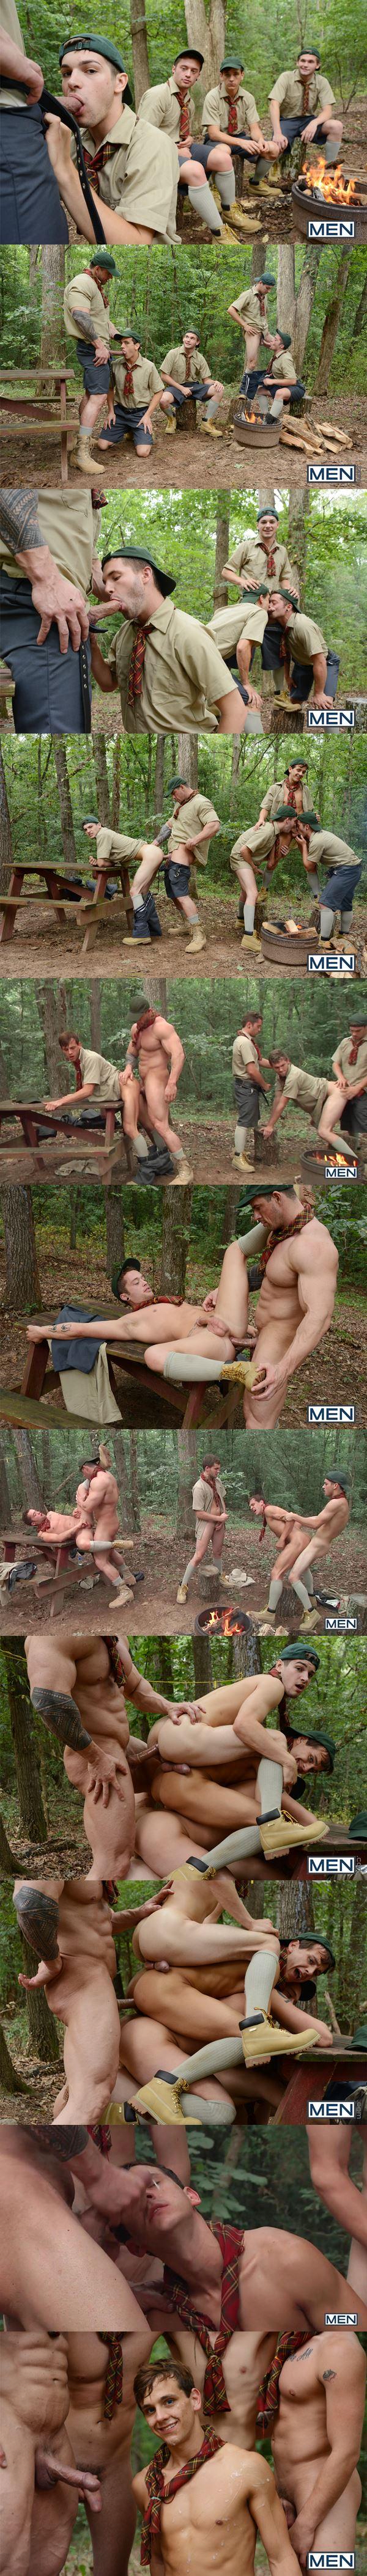 Muscle god Zeb Atlas fucks hot twinks CK Steel, Jack Radley, Johnny Rapid and Zac Stevens in Scouts Part 4 at Jizzorgy 02